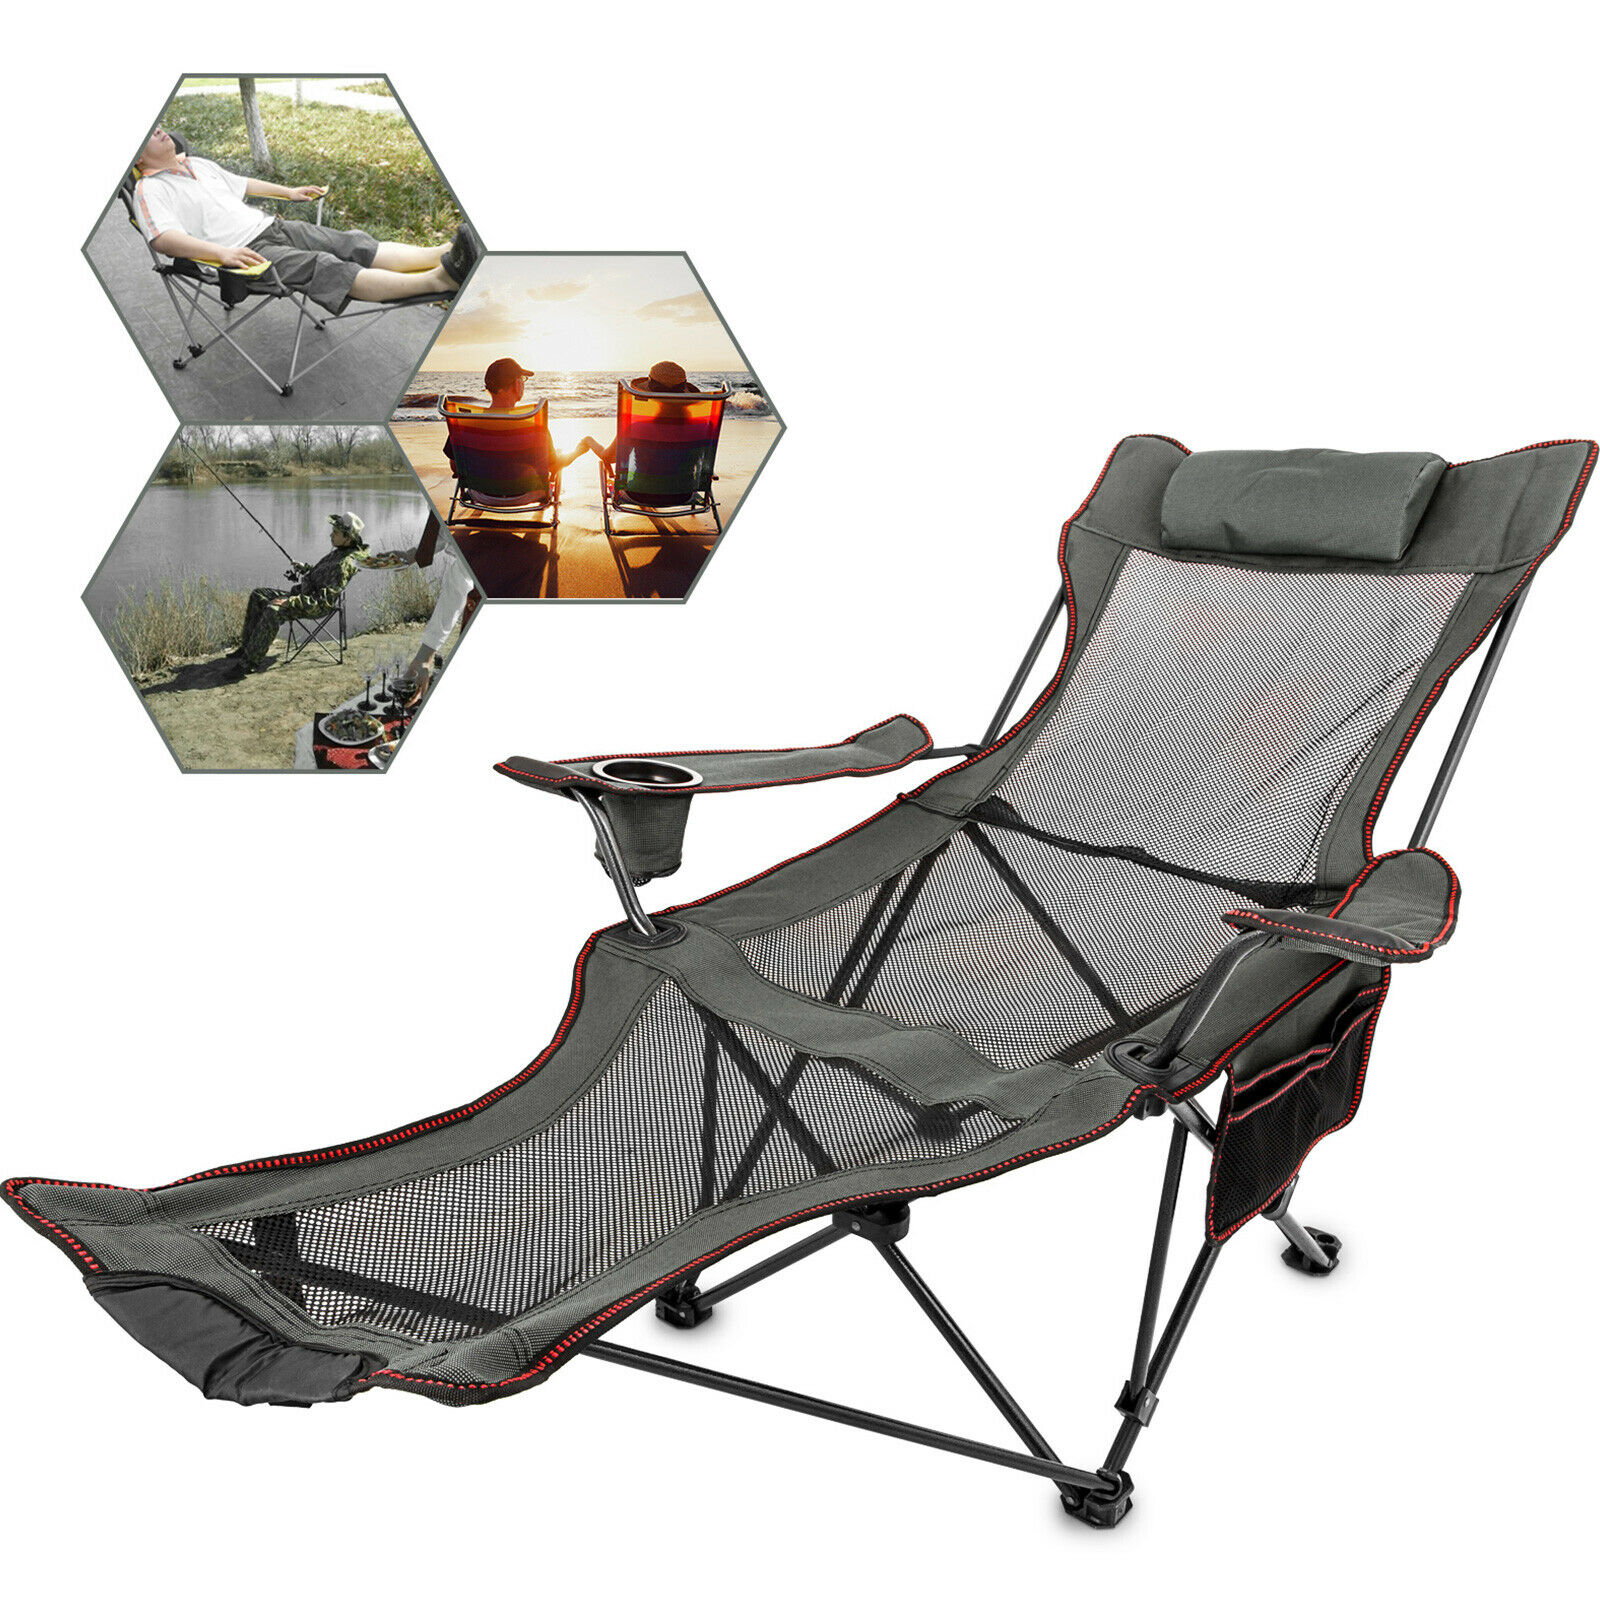 VEVOR Reclining Folding Camp Chair with Headrest 1